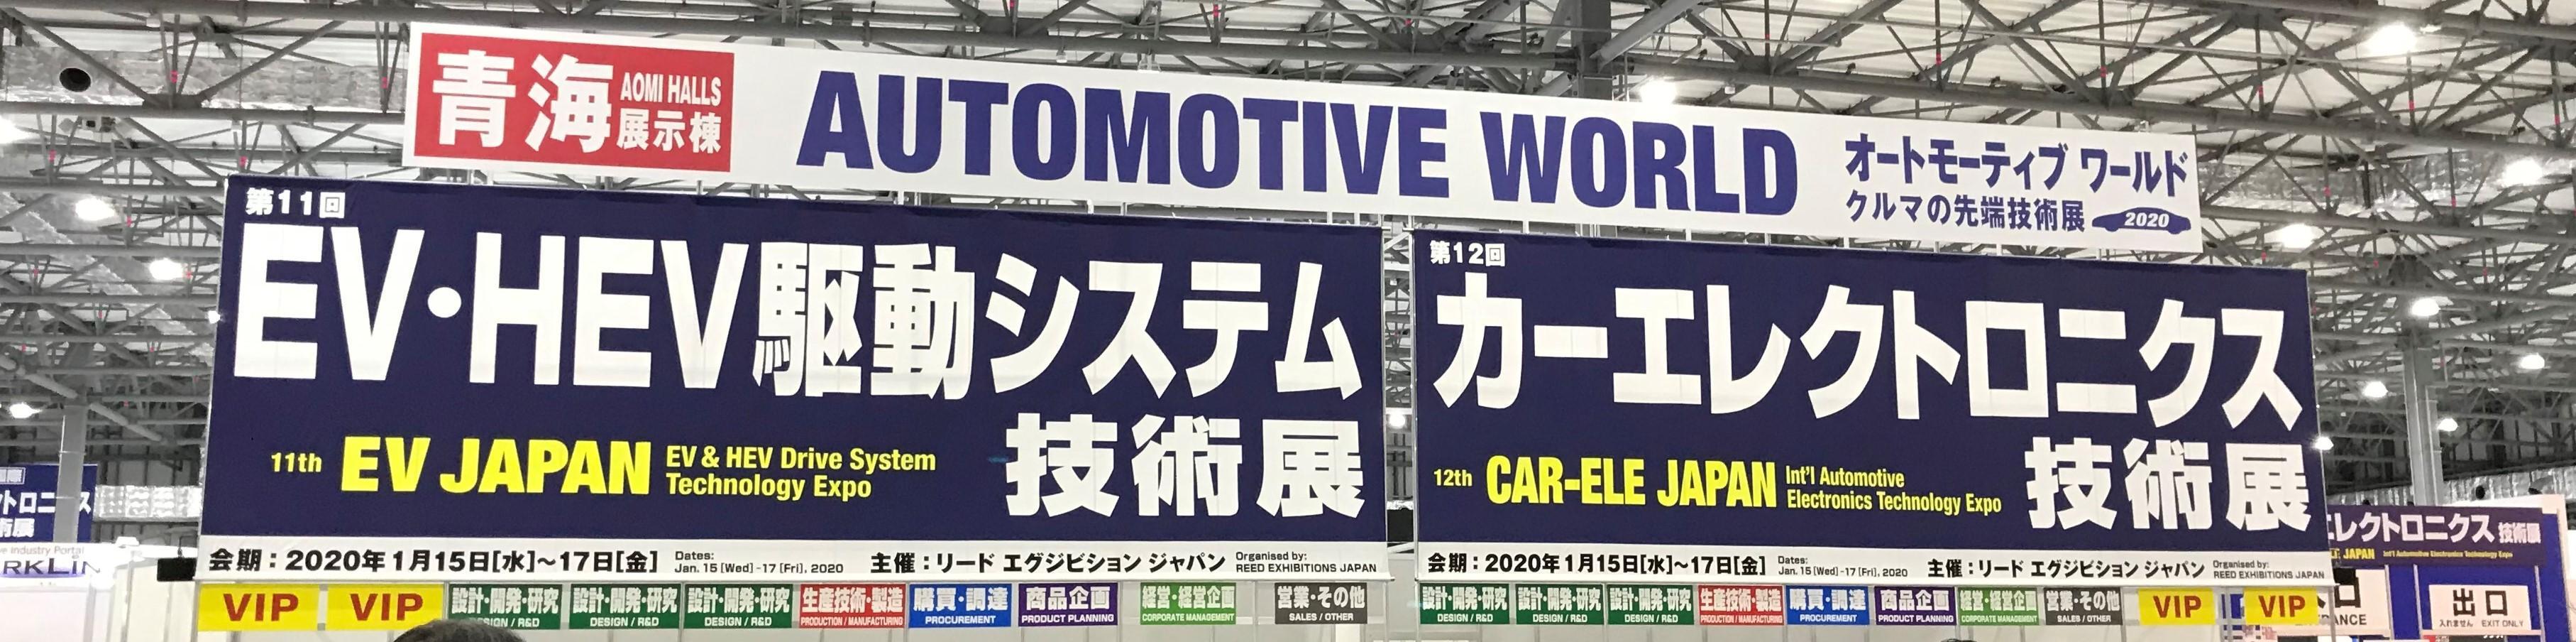 https://www.pues.co.jp/jp/blog/IMG_4619.JPG